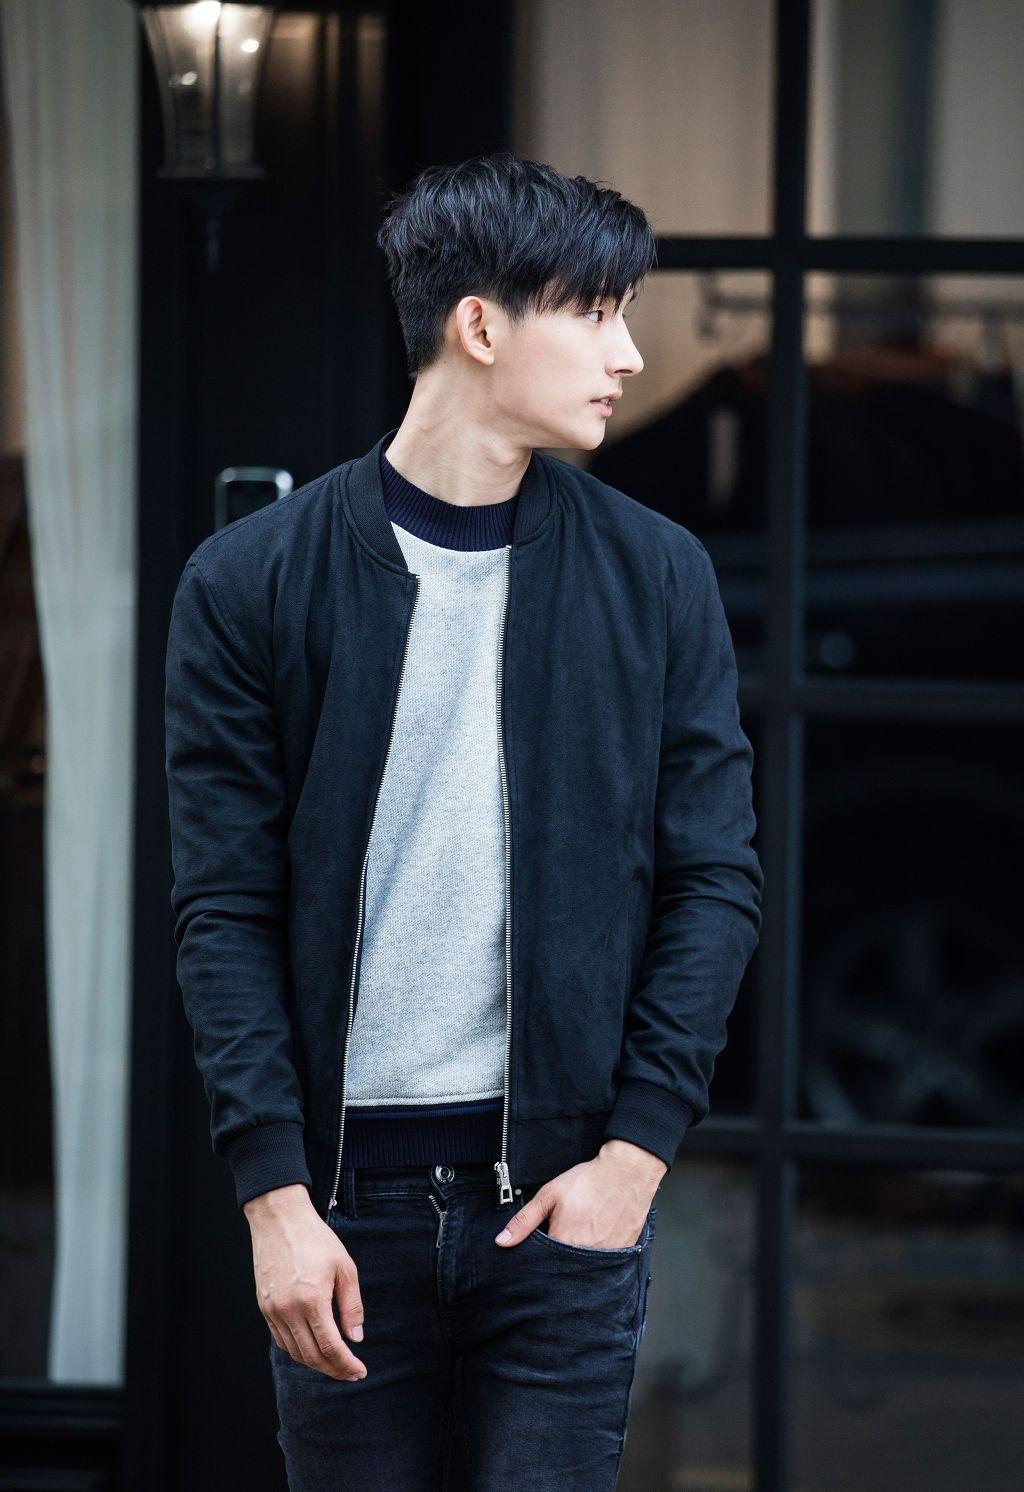 Park Hyeong Seop For Zara Thestyles Asian Men